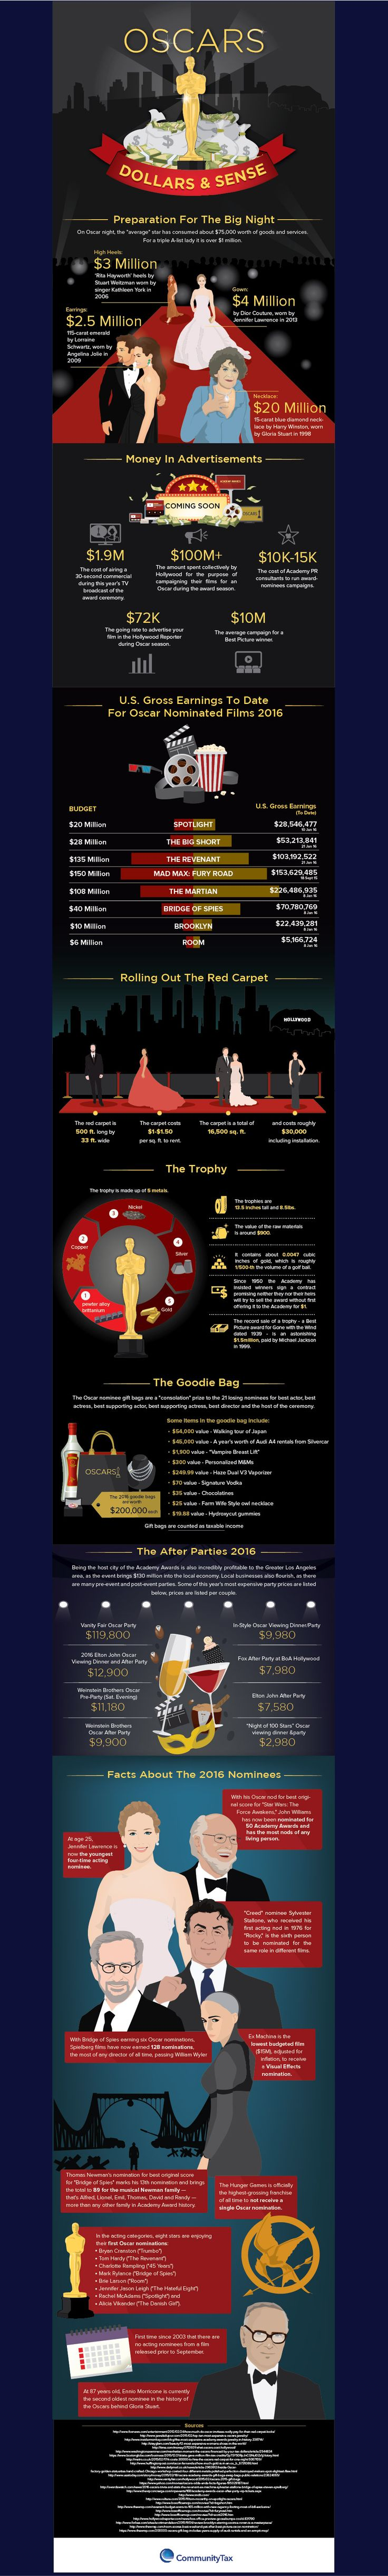 fritzR - OSCARS academy award infographic